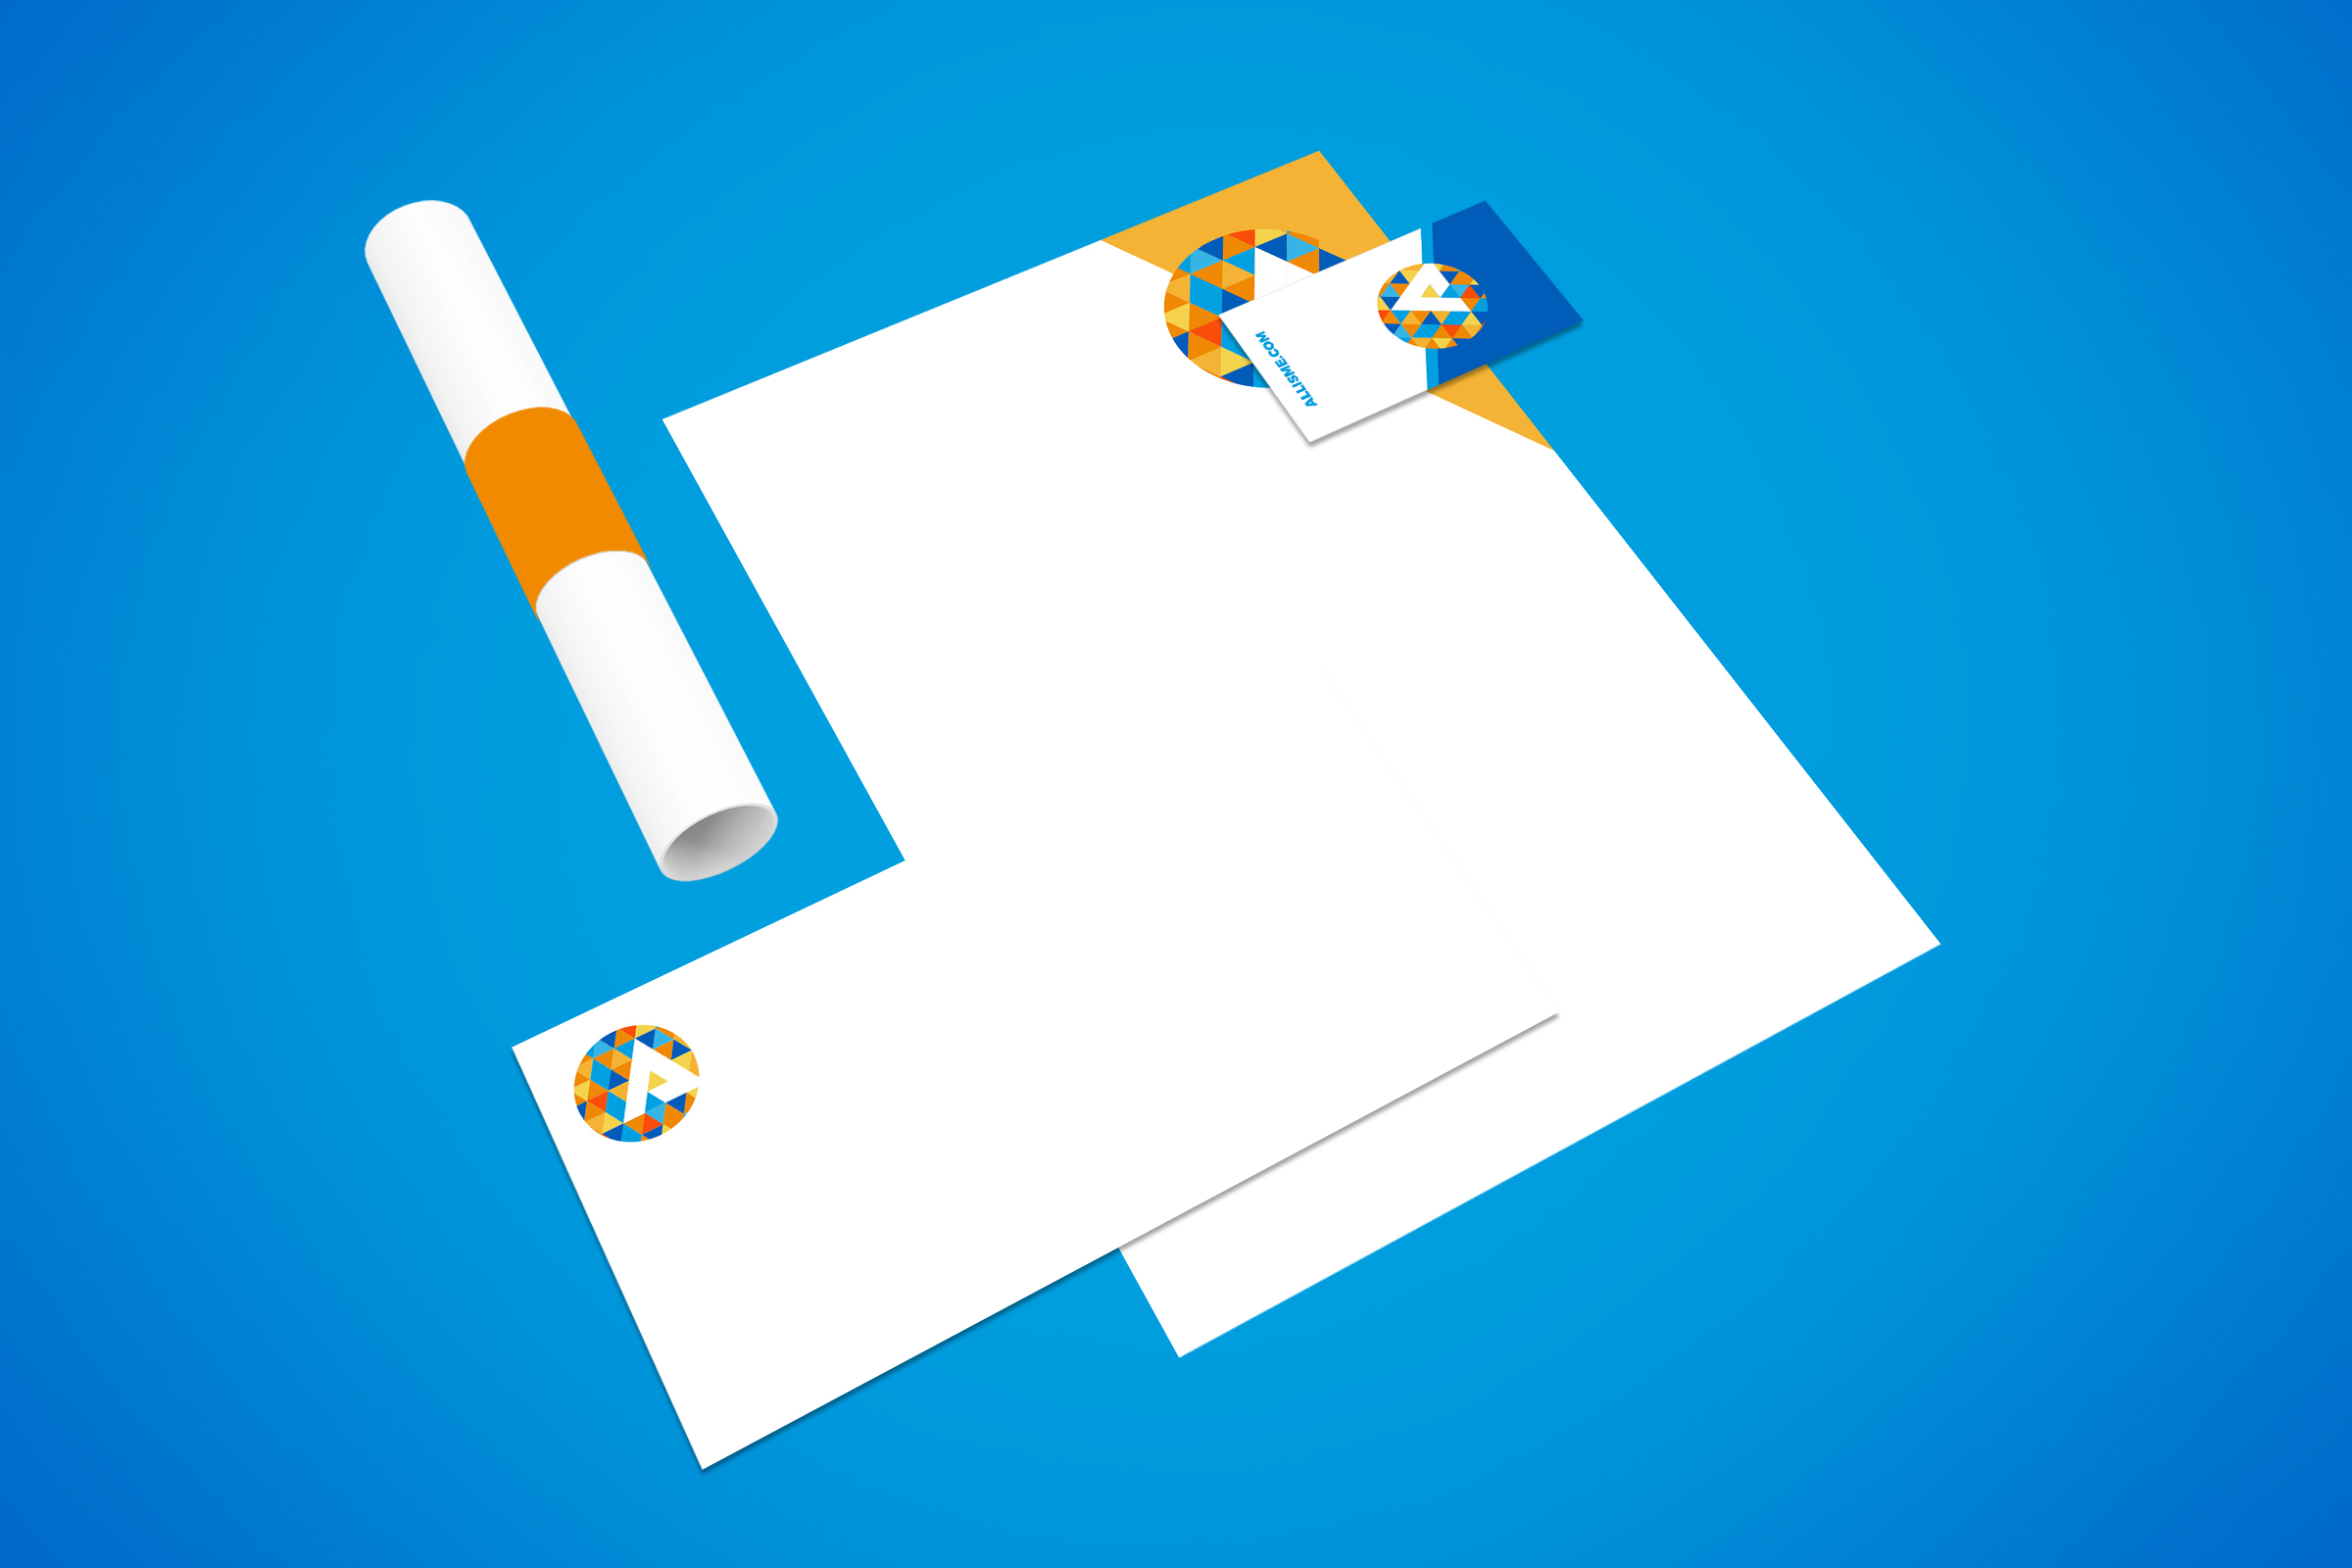 hearthfire-creative-logo-brand-identity-designer-denver-colorado-all-is-me-3.jpg